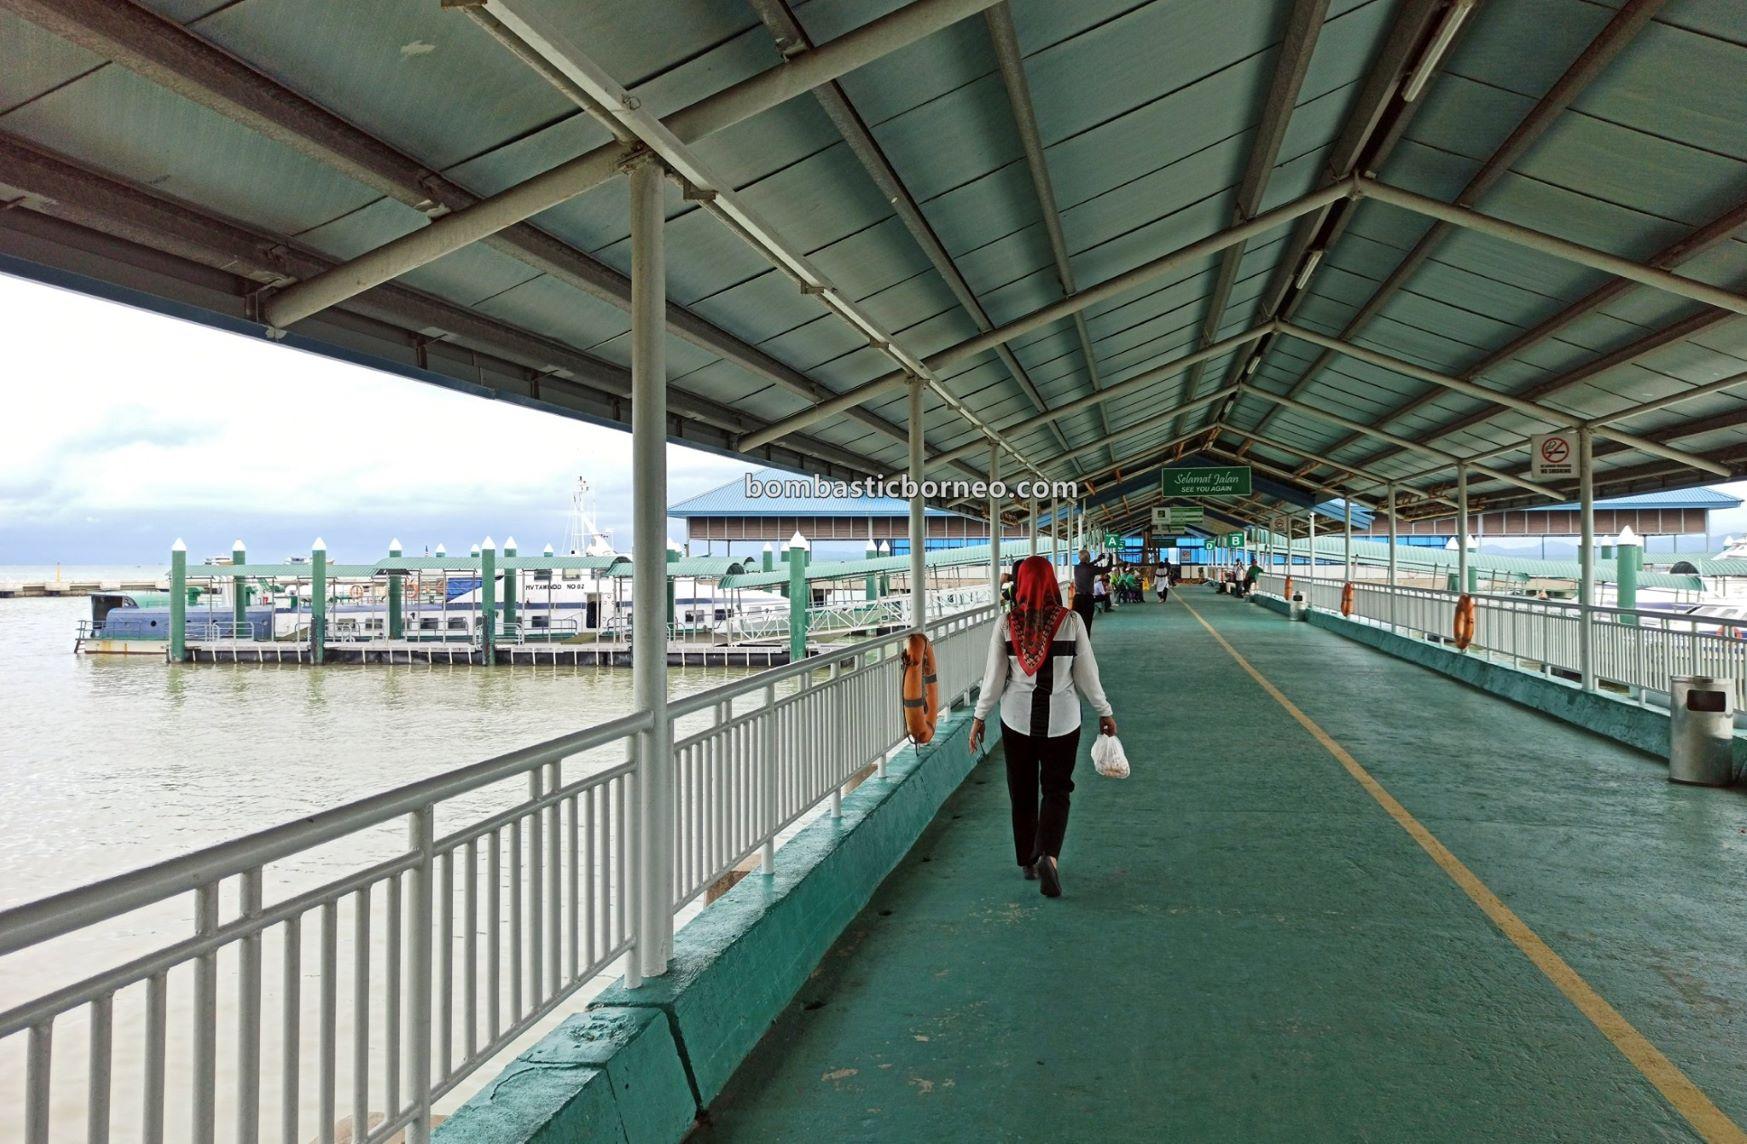 North Kalimantan, Feri port, backpackers, destination, exploration, Pekan, town, Malaysia, Tourism, tourist attraction, Travel Guide, 穿越婆罗洲游踪, 马来西亚沙巴, 斗湖轮渡码头